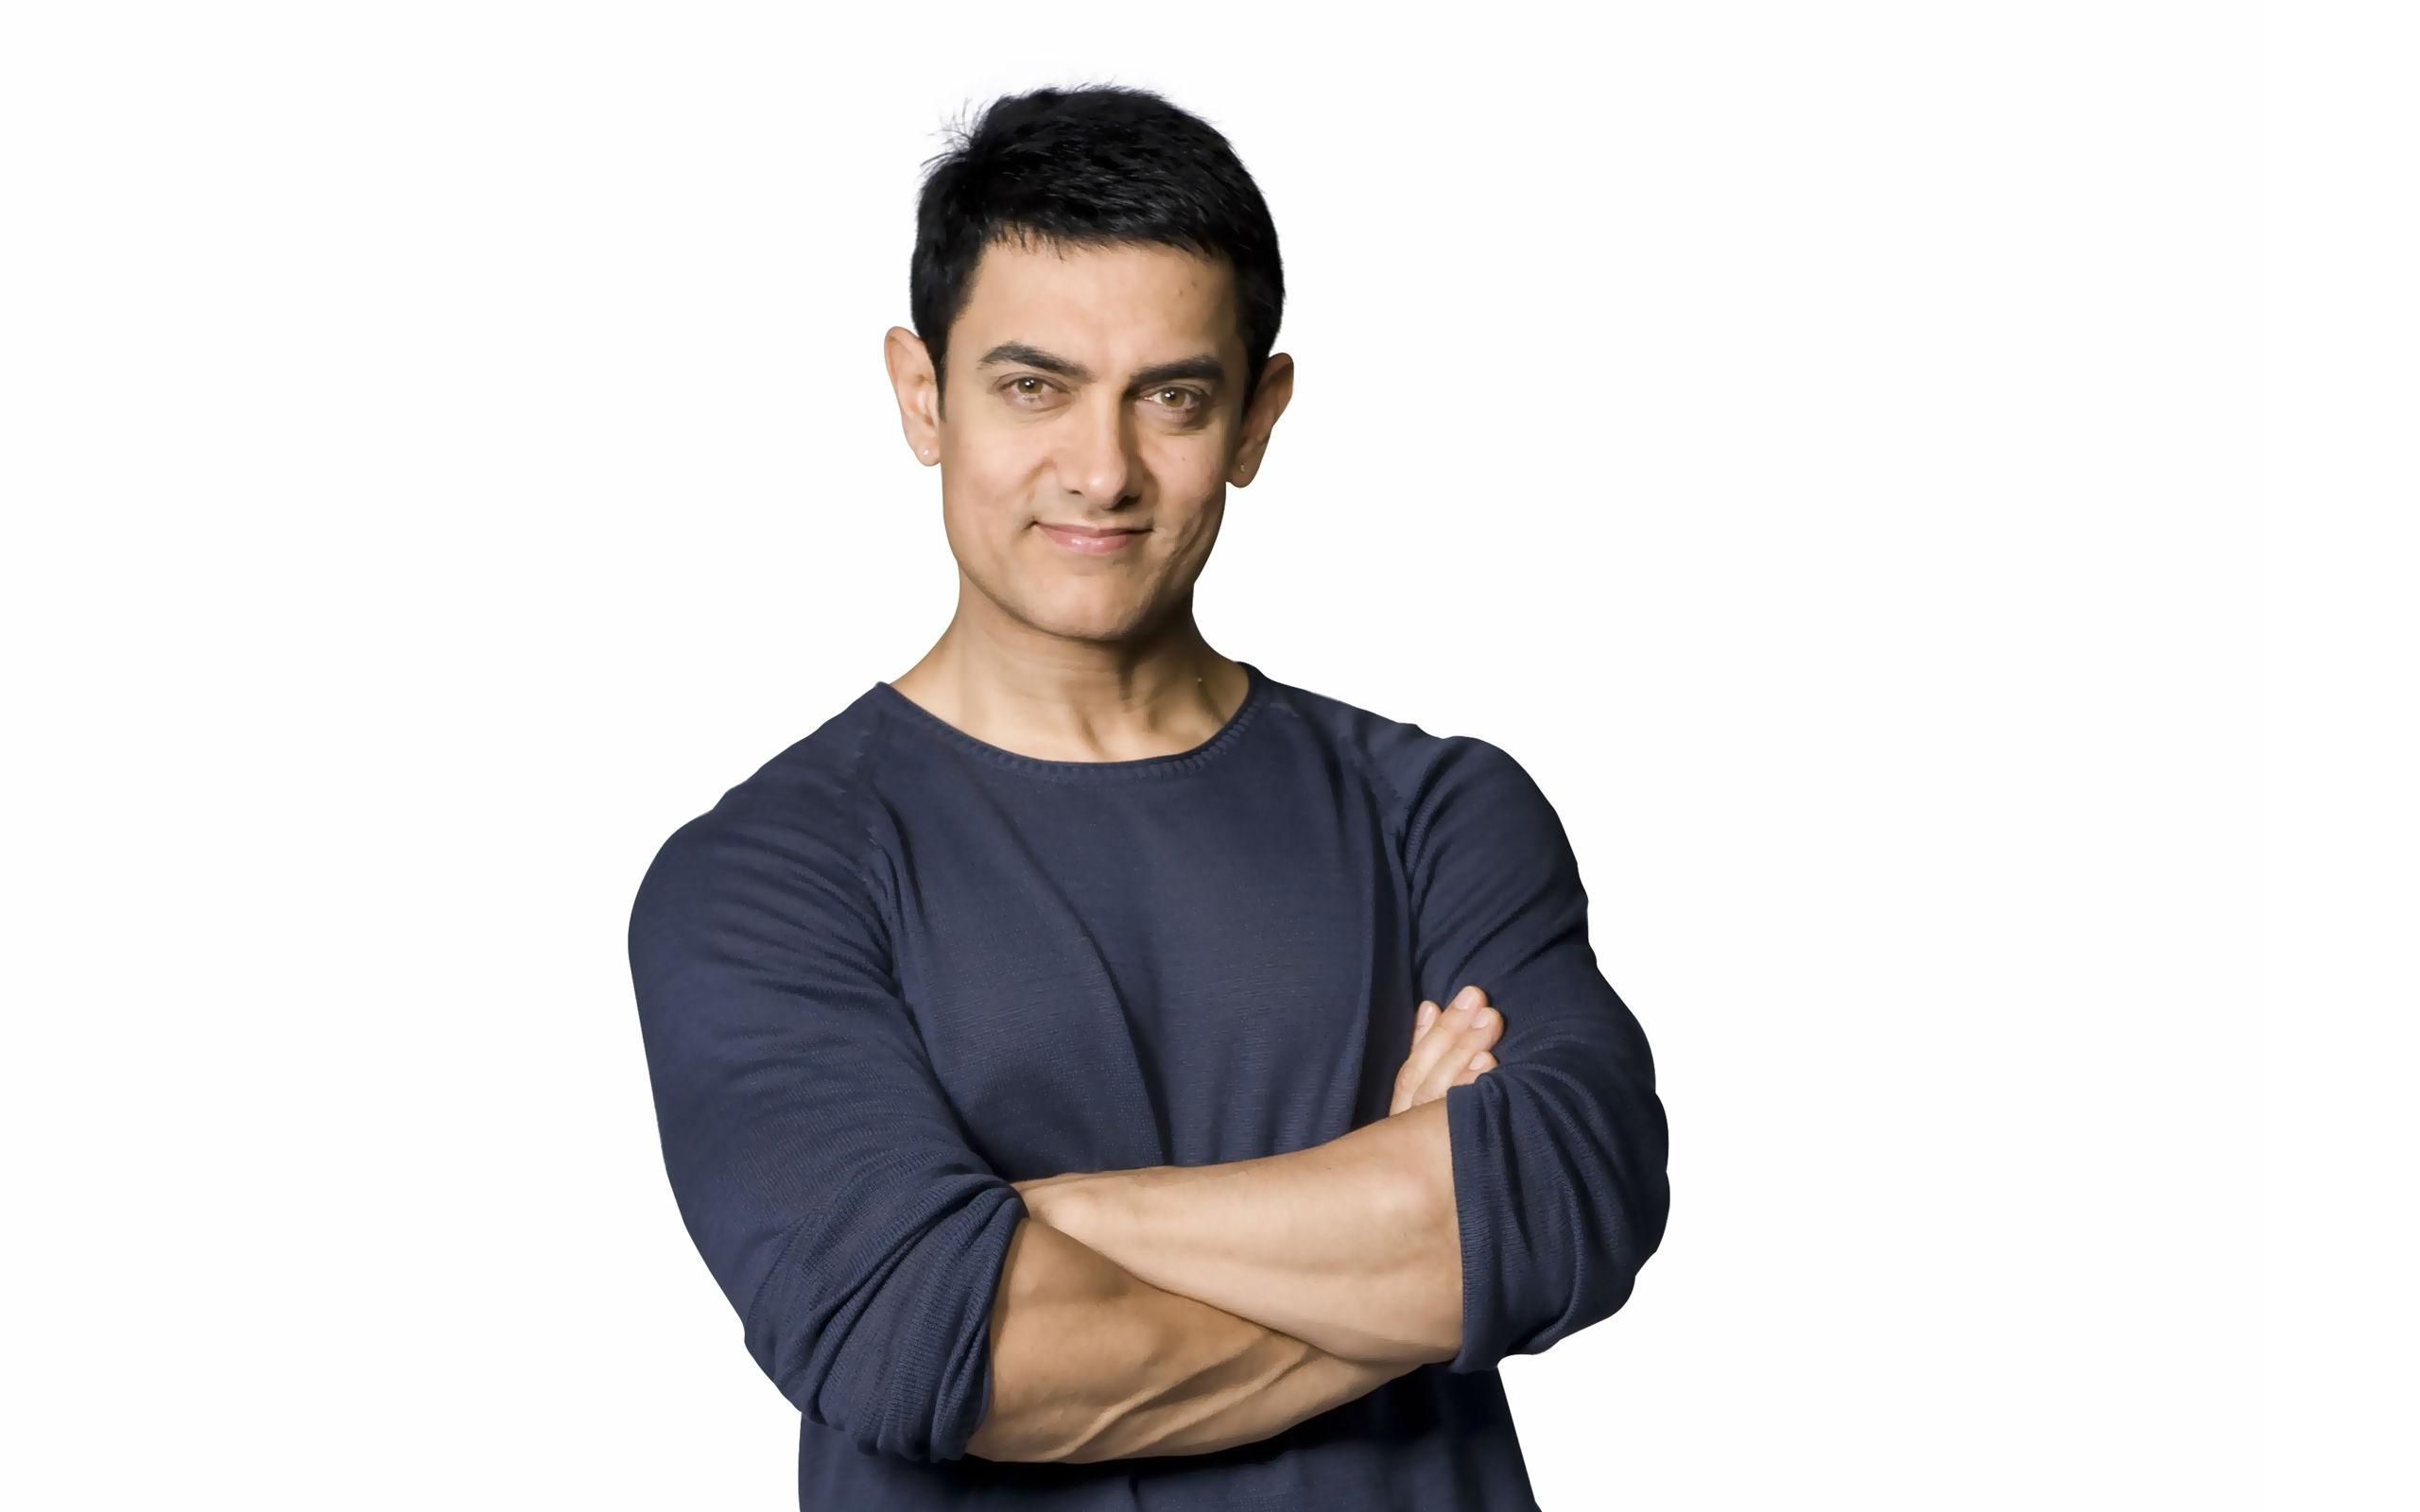 Amir khan house images Aamir, Hrithik, Ranbir, Farhan: Posh celebrity houses - m